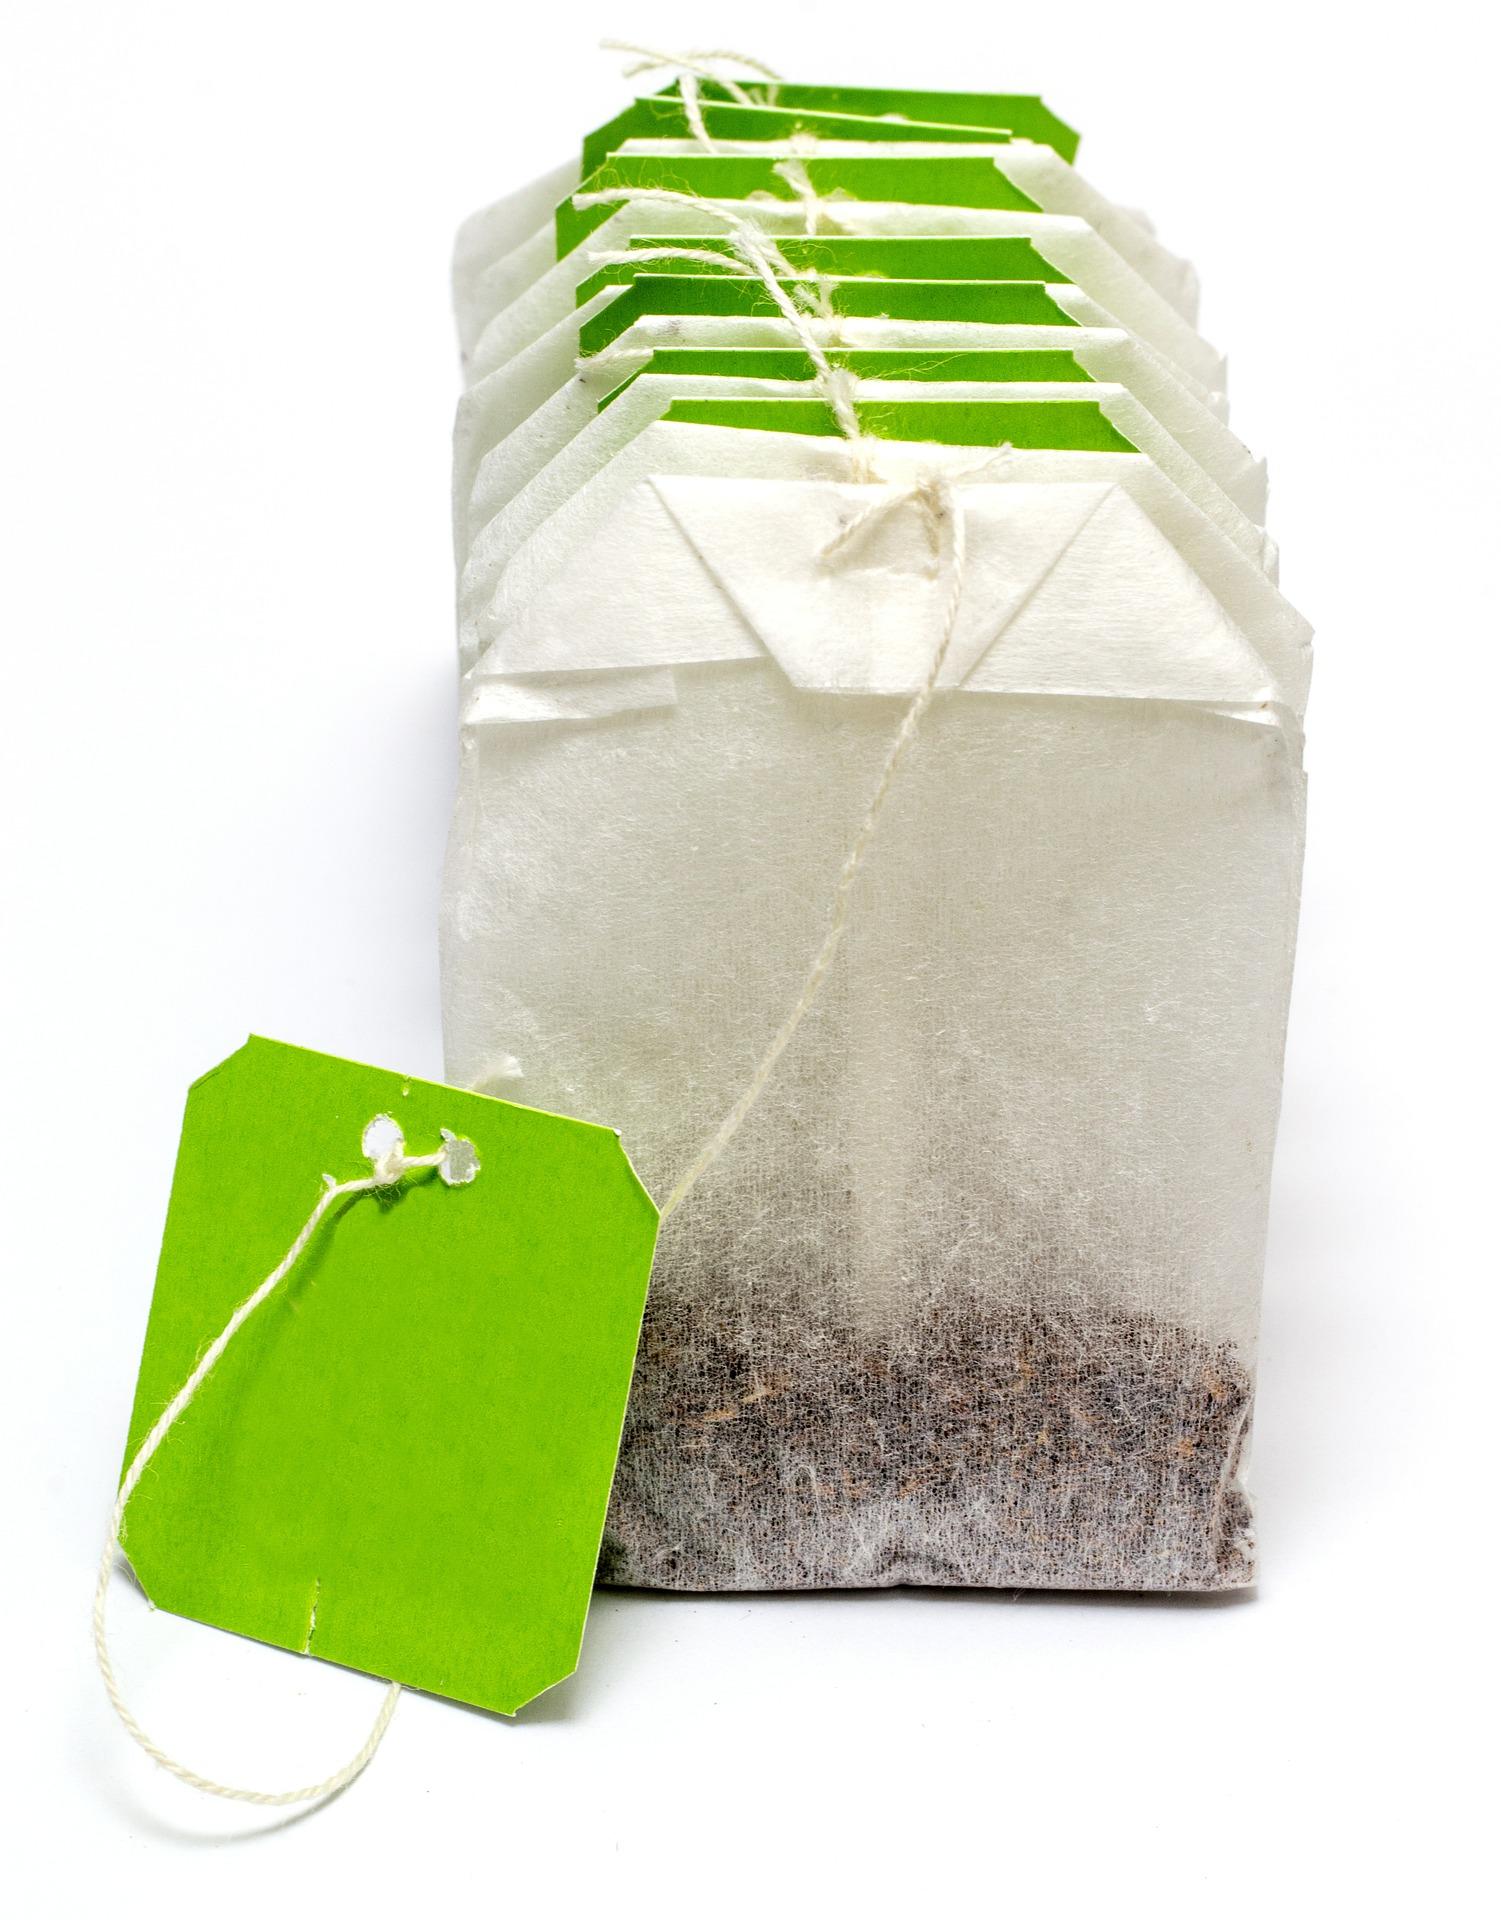 Importance of green tea